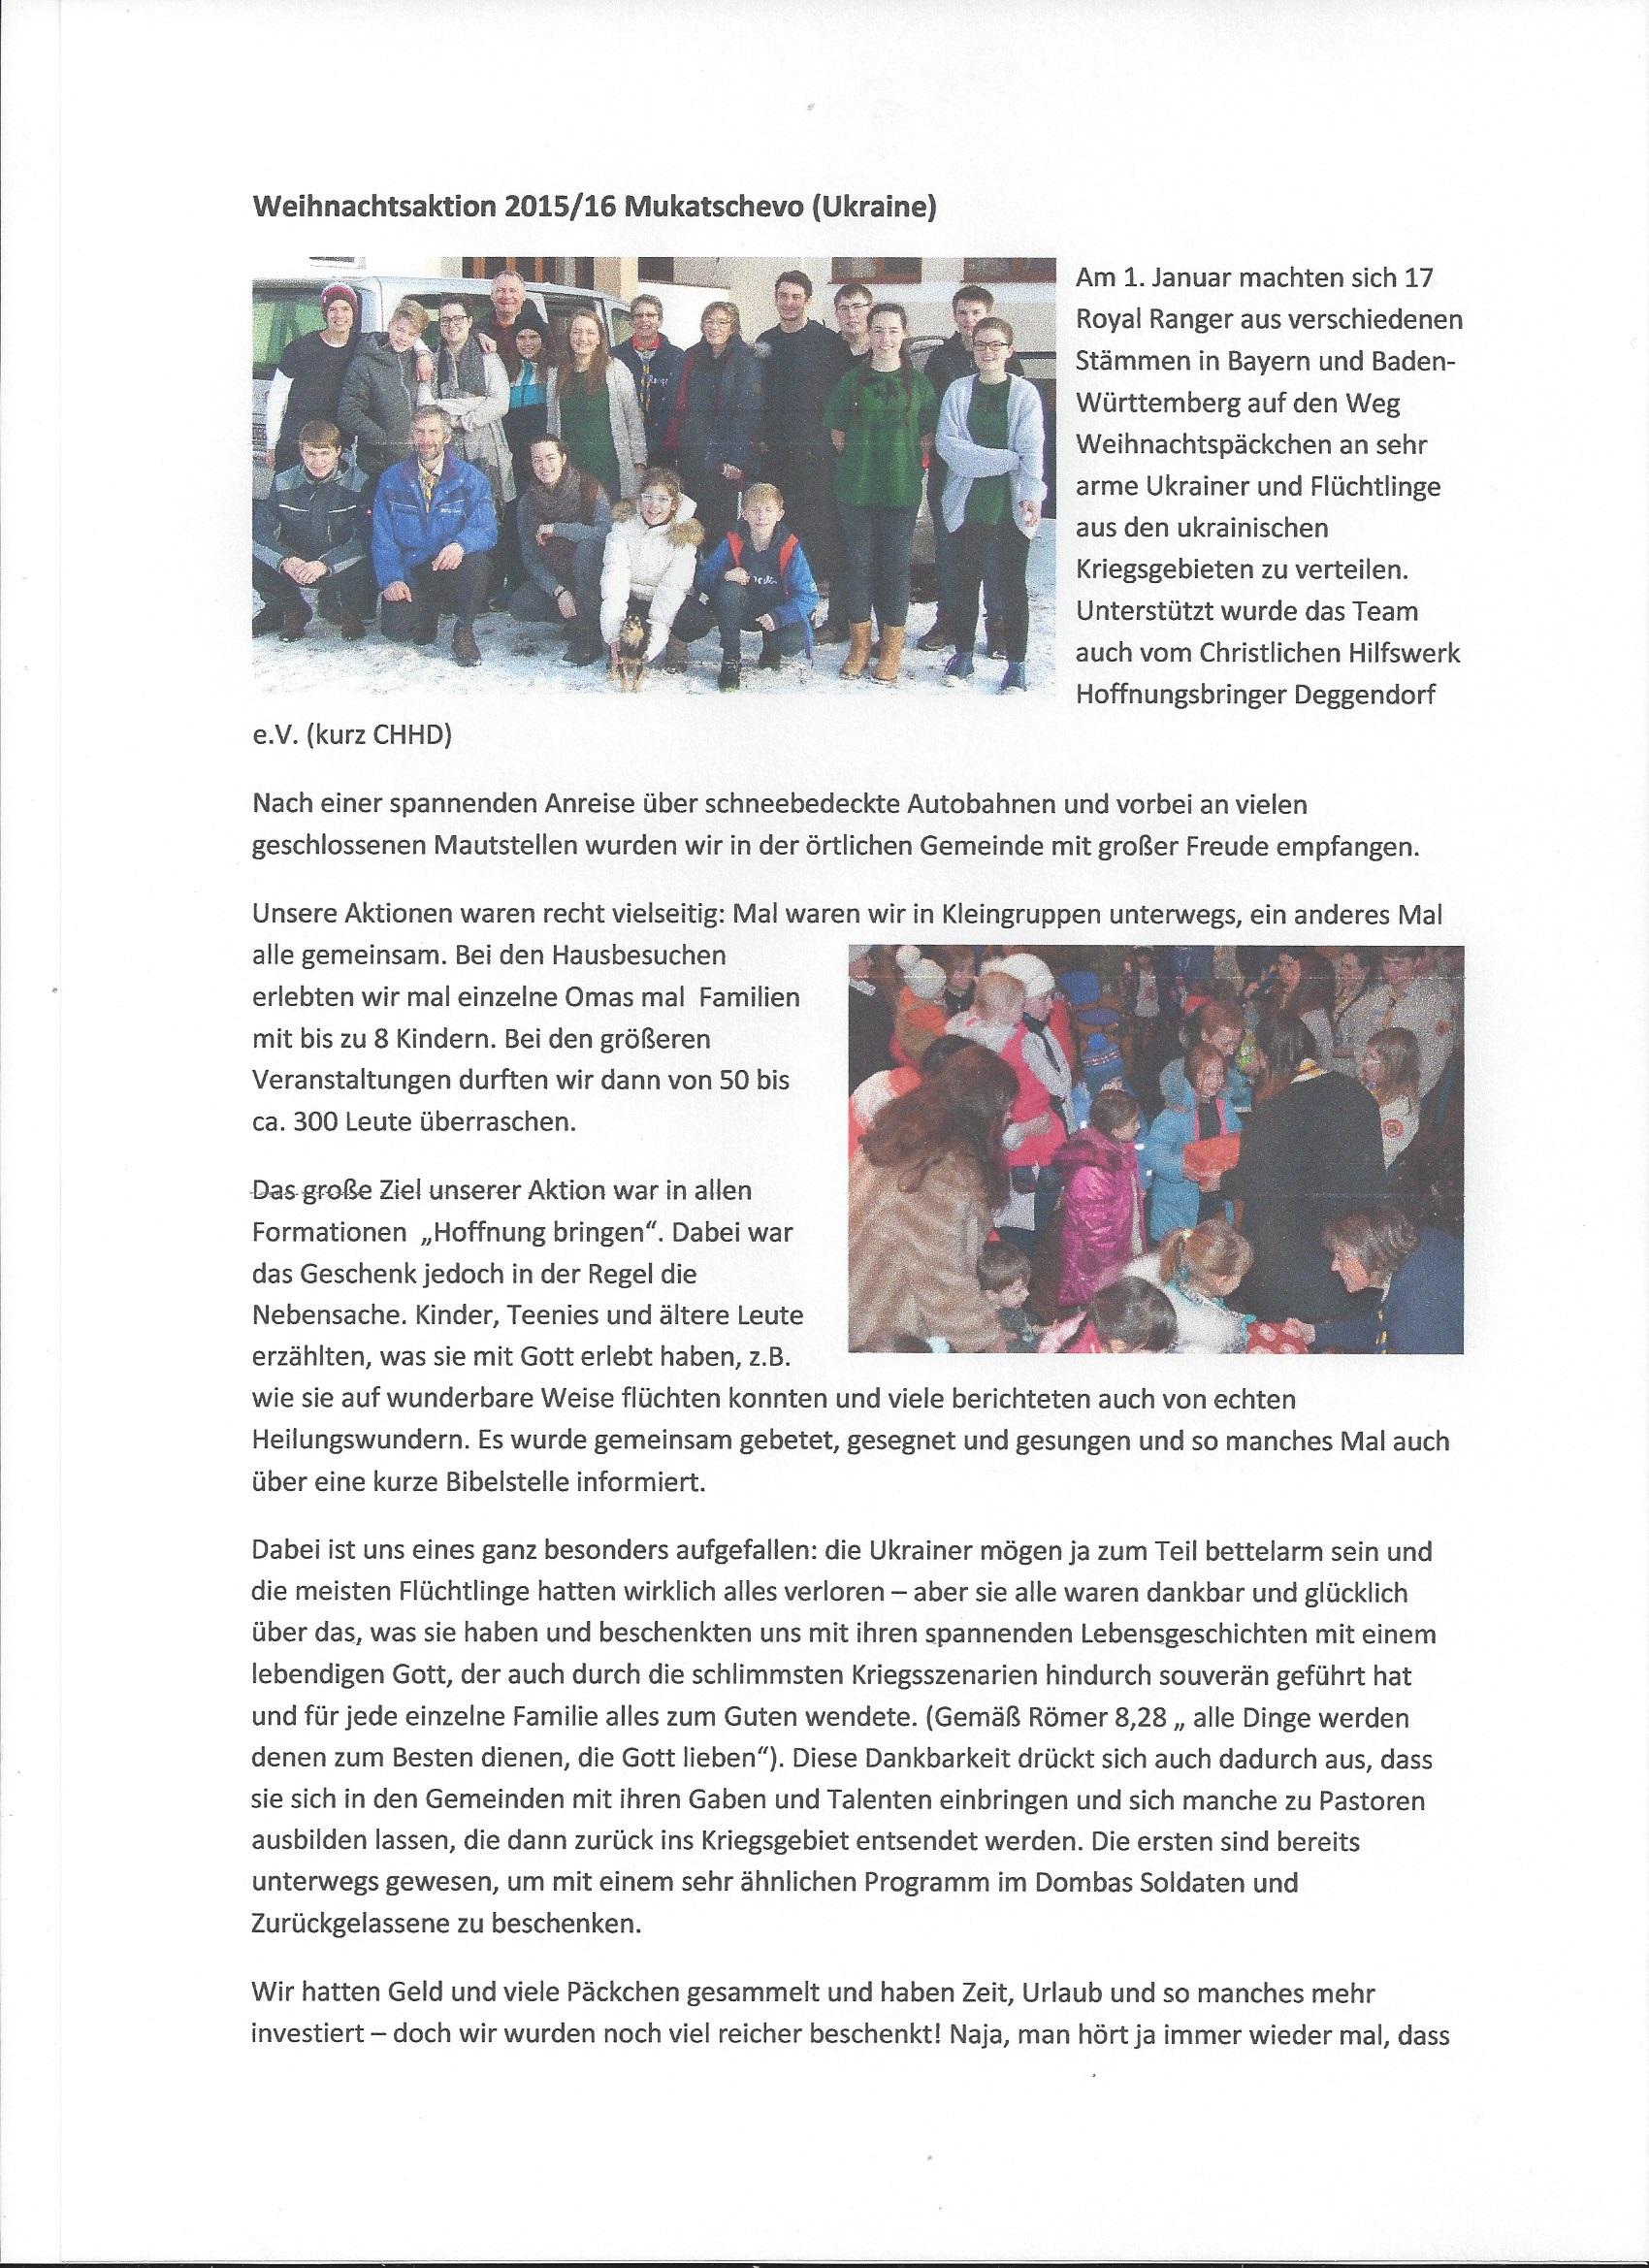 ReiseberichtWA15-16